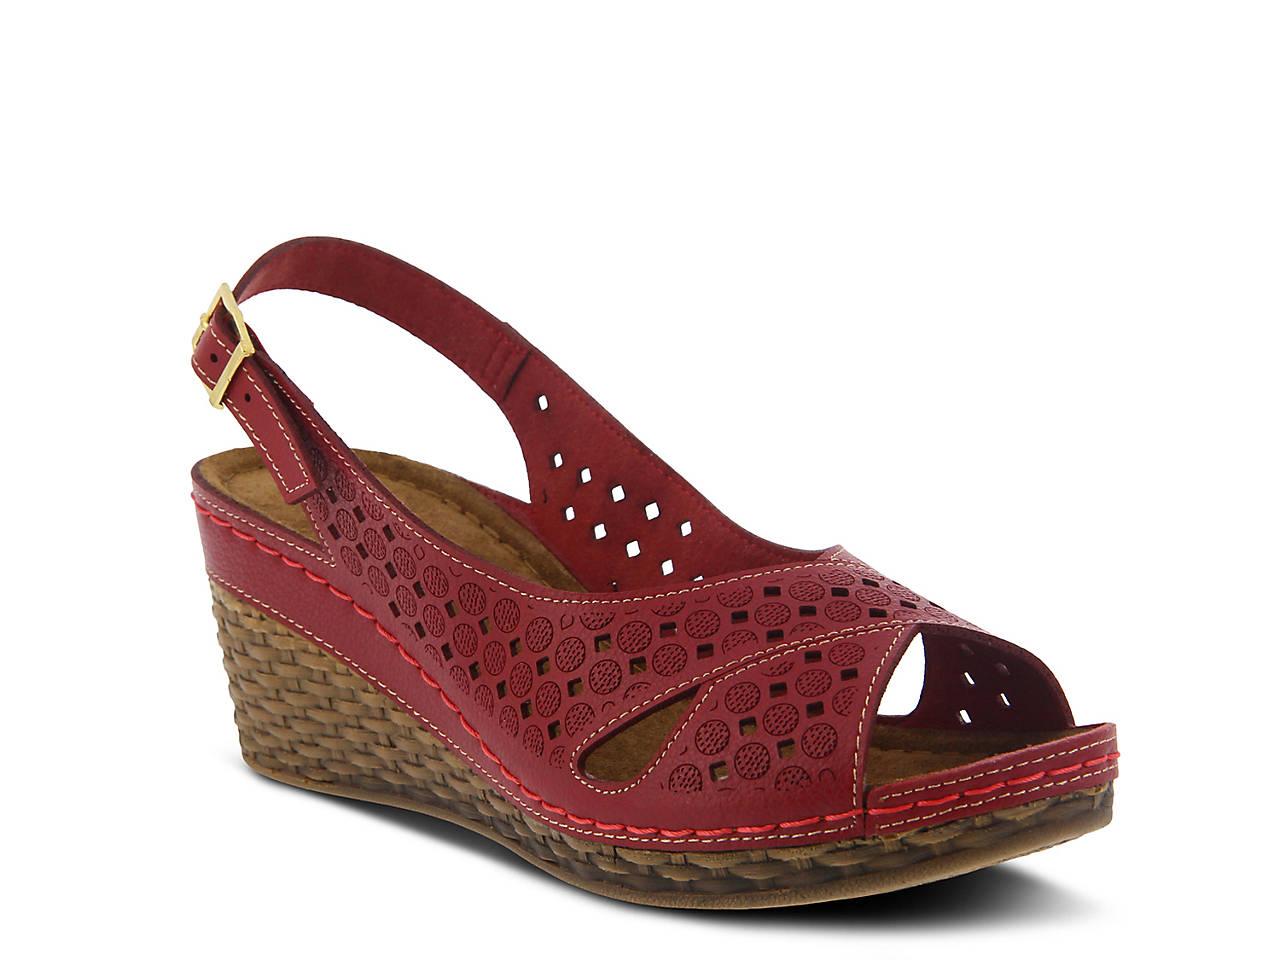 451f0e15262a Flexus by Spring Step Michalis Wedge Sandal Women s Shoes